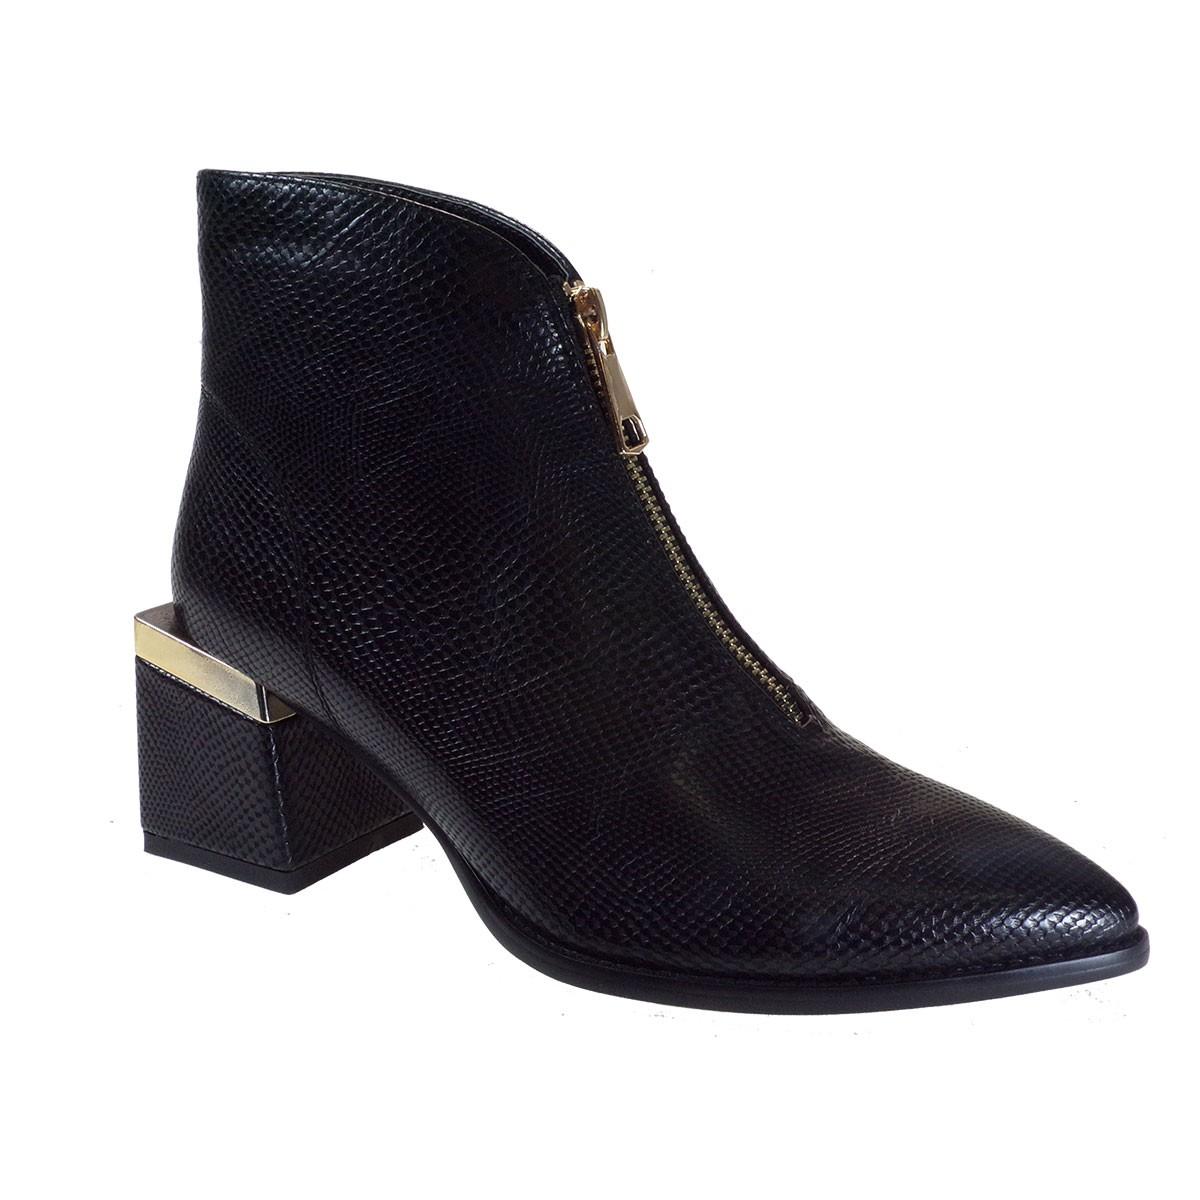 Exe Shoes Γυναικεία Παπούτσια Μποτάκια 903-67V Μαύρo L367V9033006